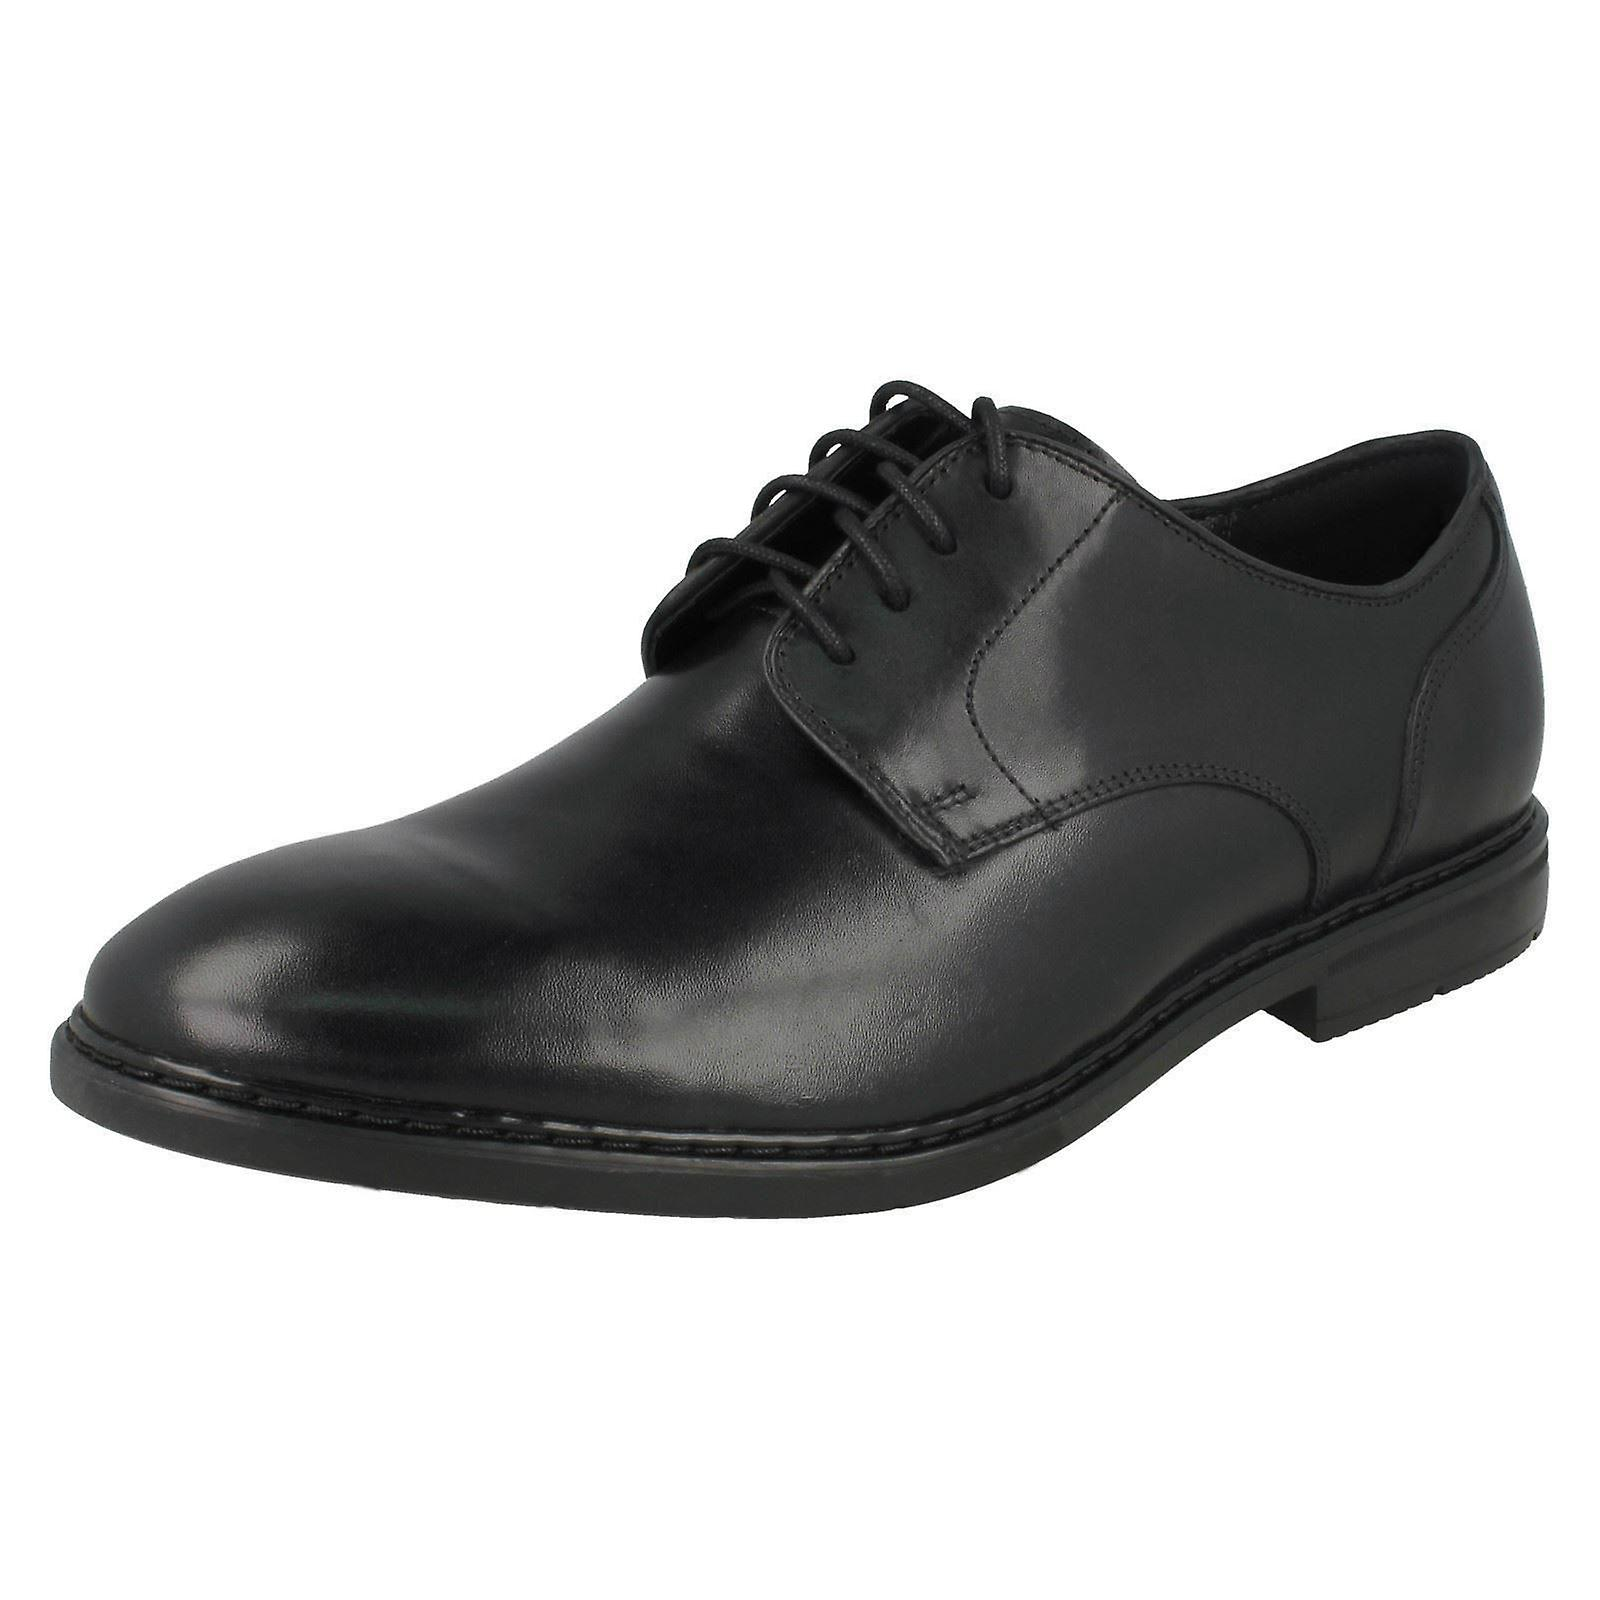 Herren Clarks formale Schuhe Banbury Lace - schwarzes Leder - UK Größe 9G - EU Größe 43 - US Size 10M